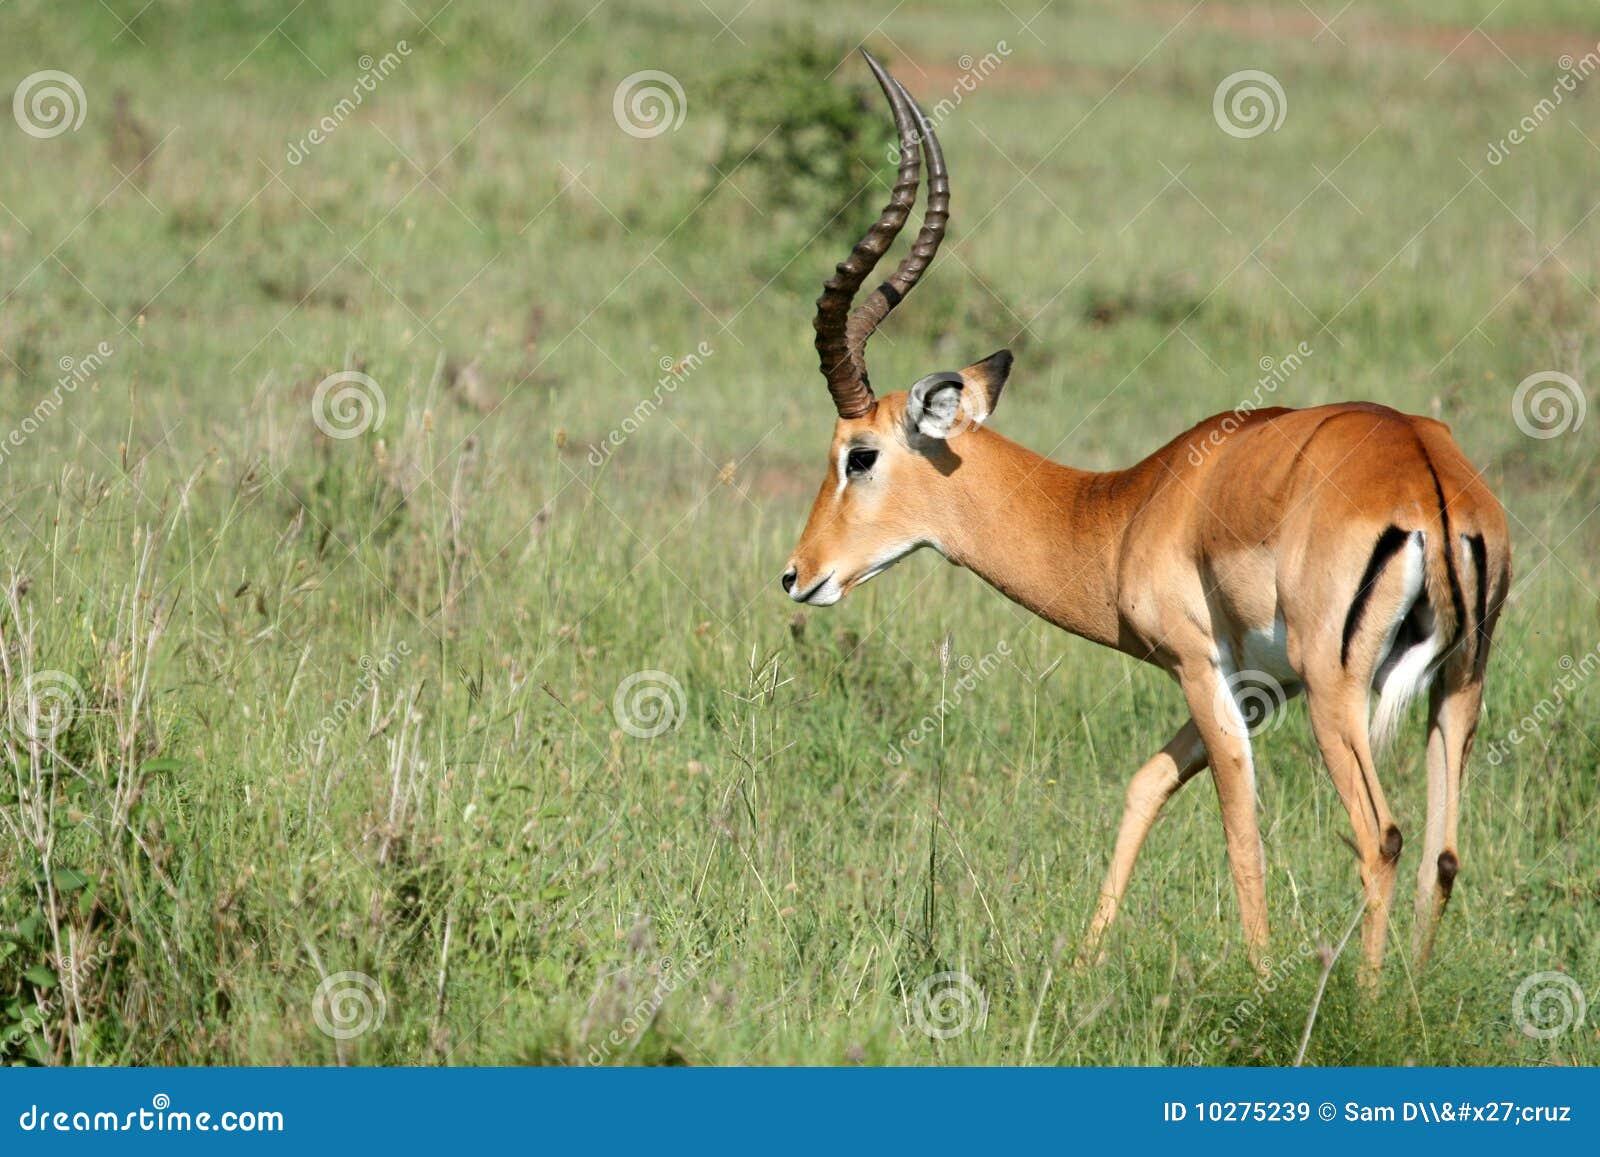 impala antelope serengeti tanzania africa royalty free. Black Bedroom Furniture Sets. Home Design Ideas